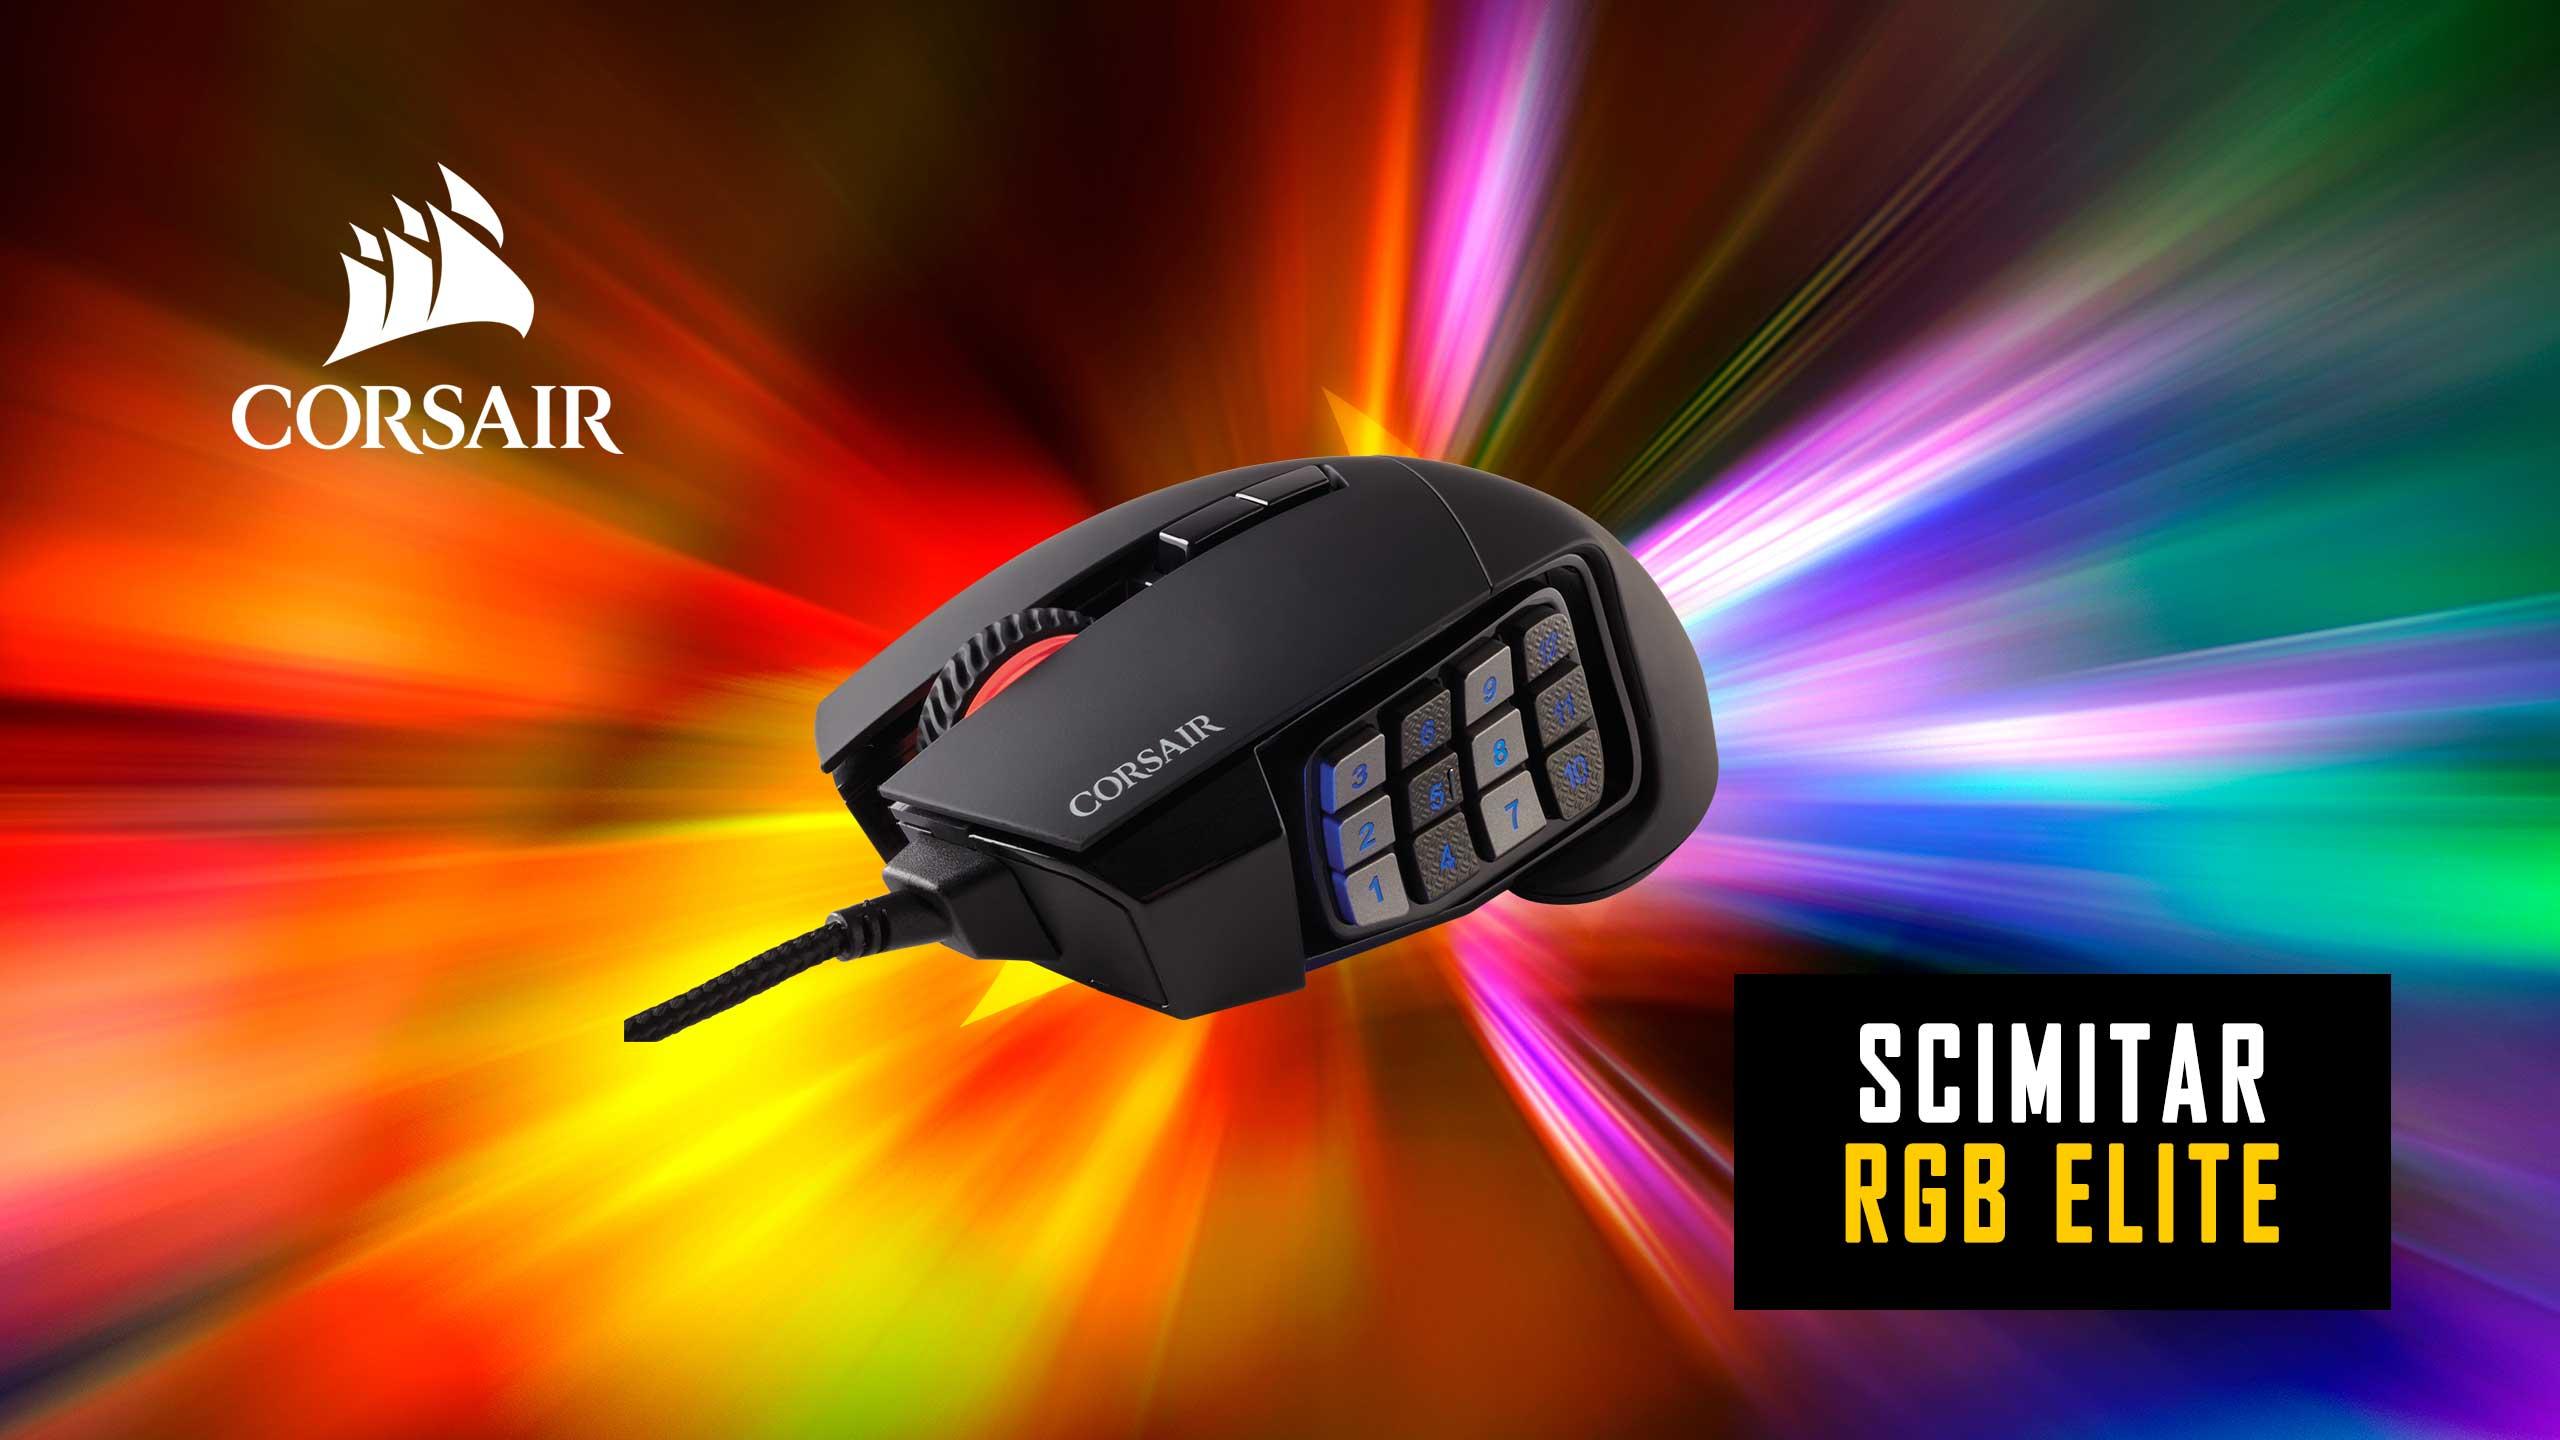 Corsair Scimitar RGB ELite Recensione